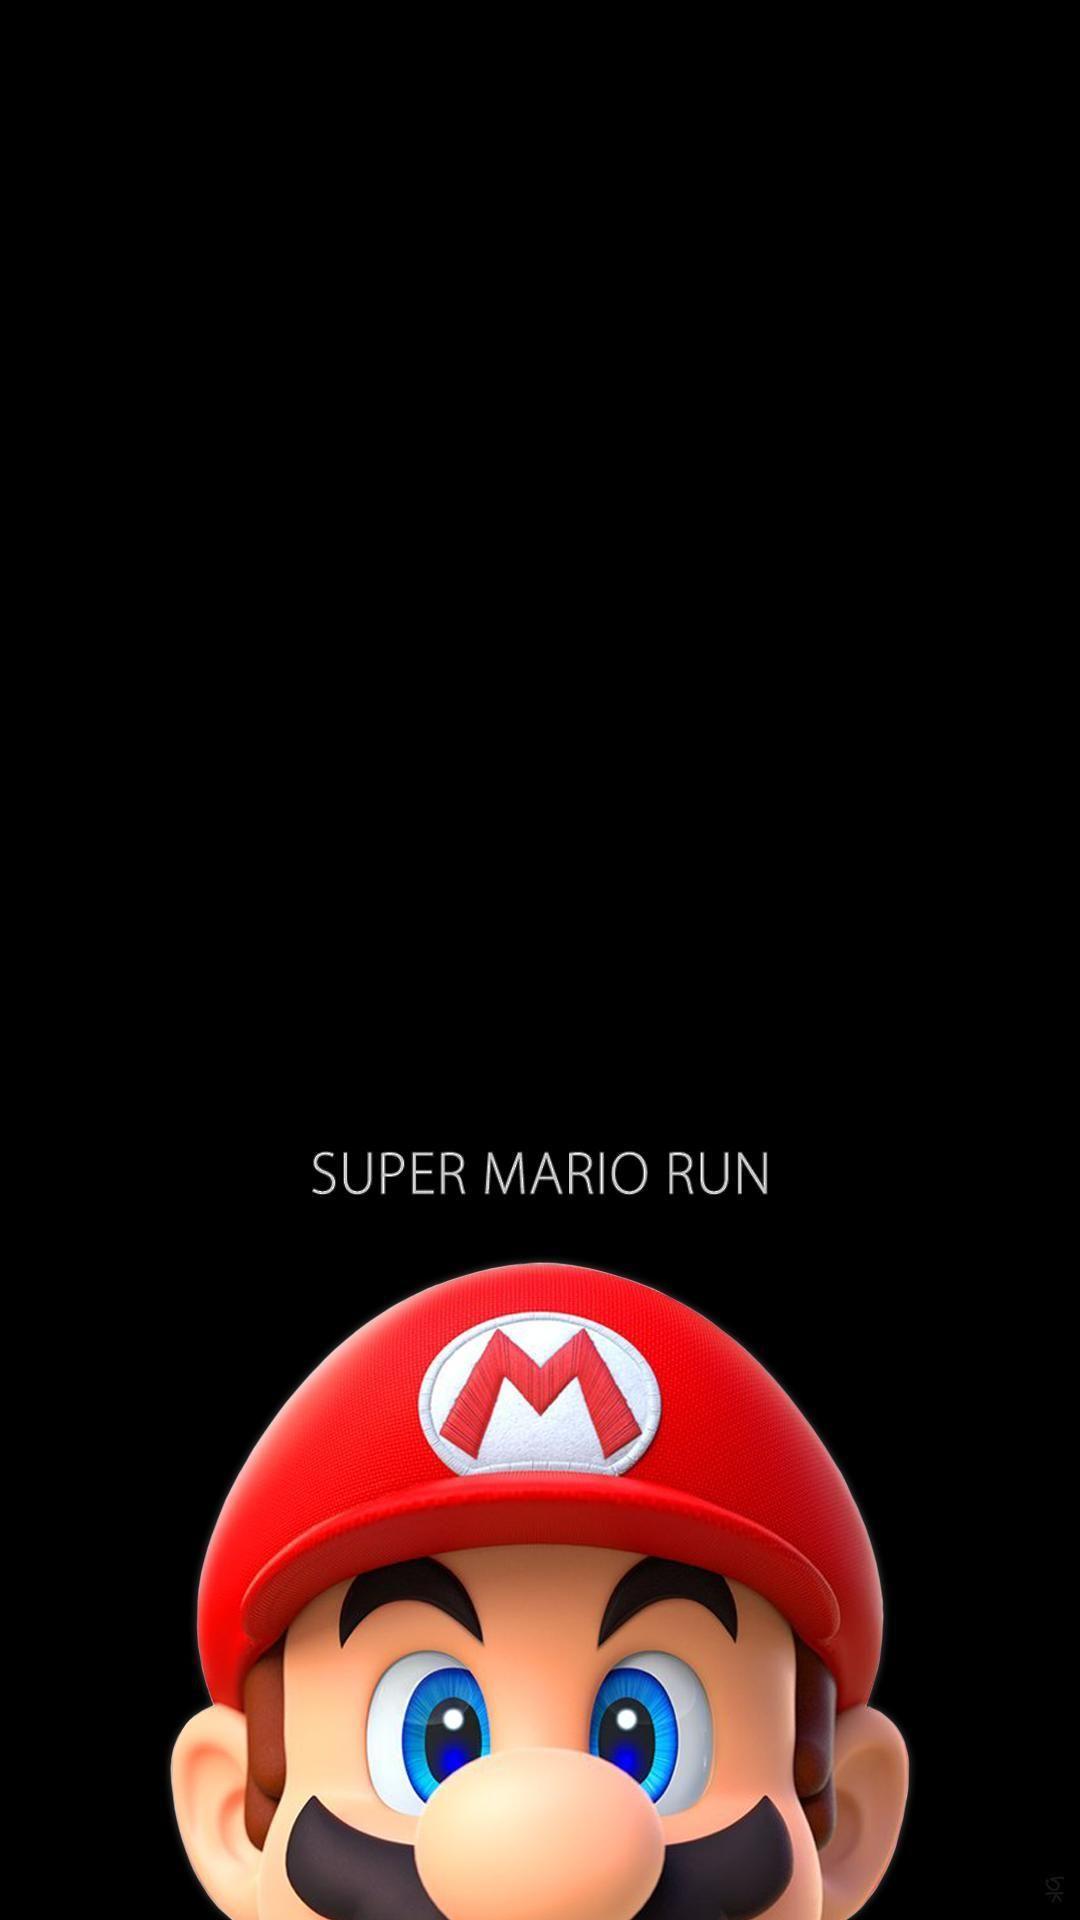 Super Mario Run ゲーム 壁紙 壁紙 スマホ壁紙